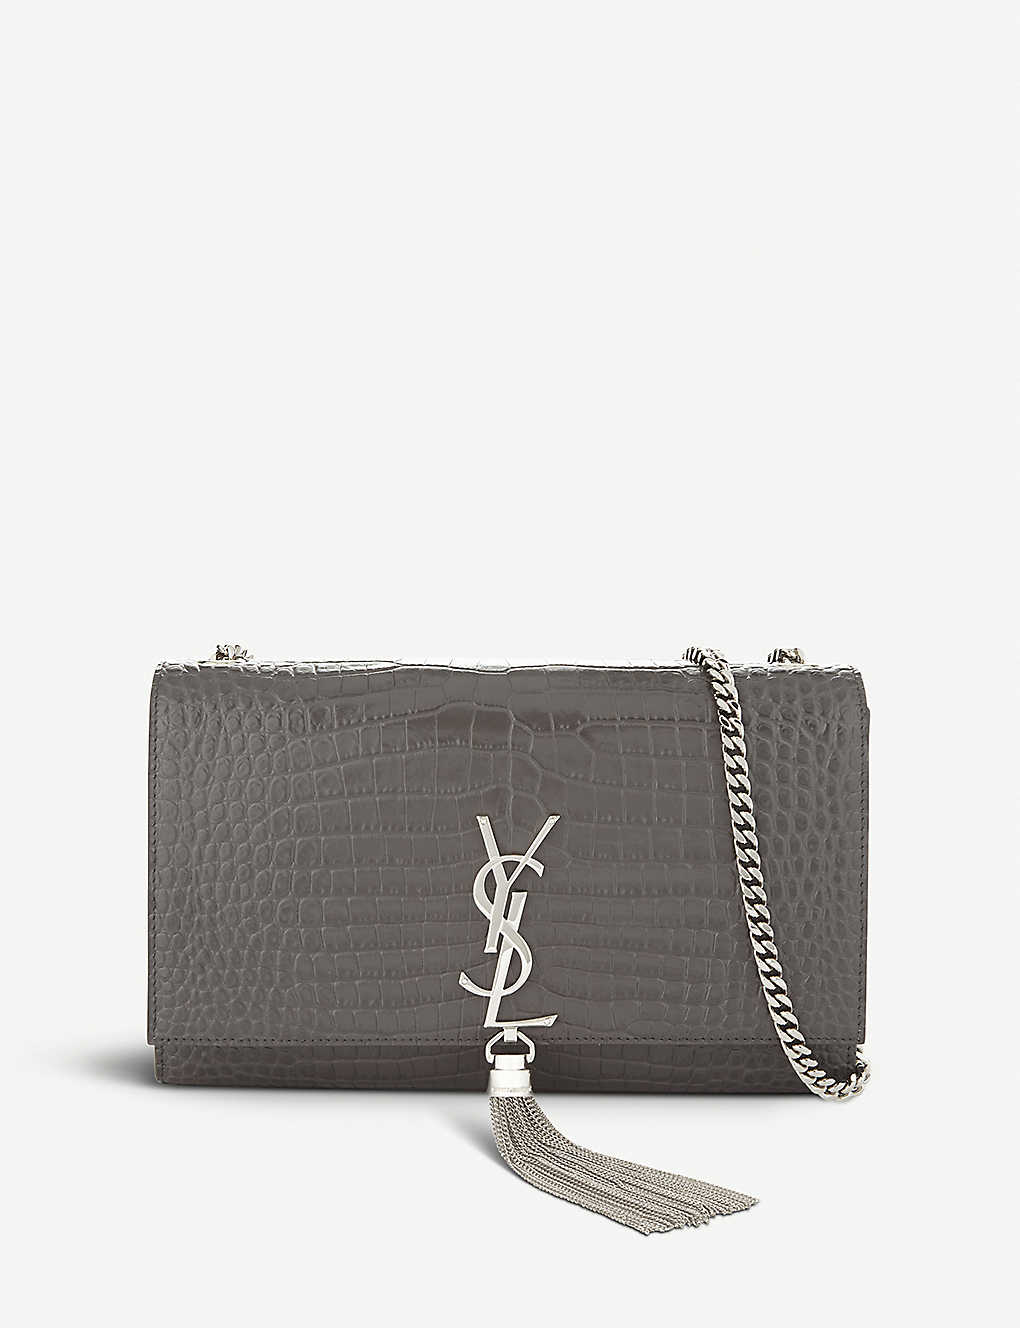 1f6890dcb69 SAINT LAURENT - Kate Tassel croc-embossed tassel leather shoulder ...